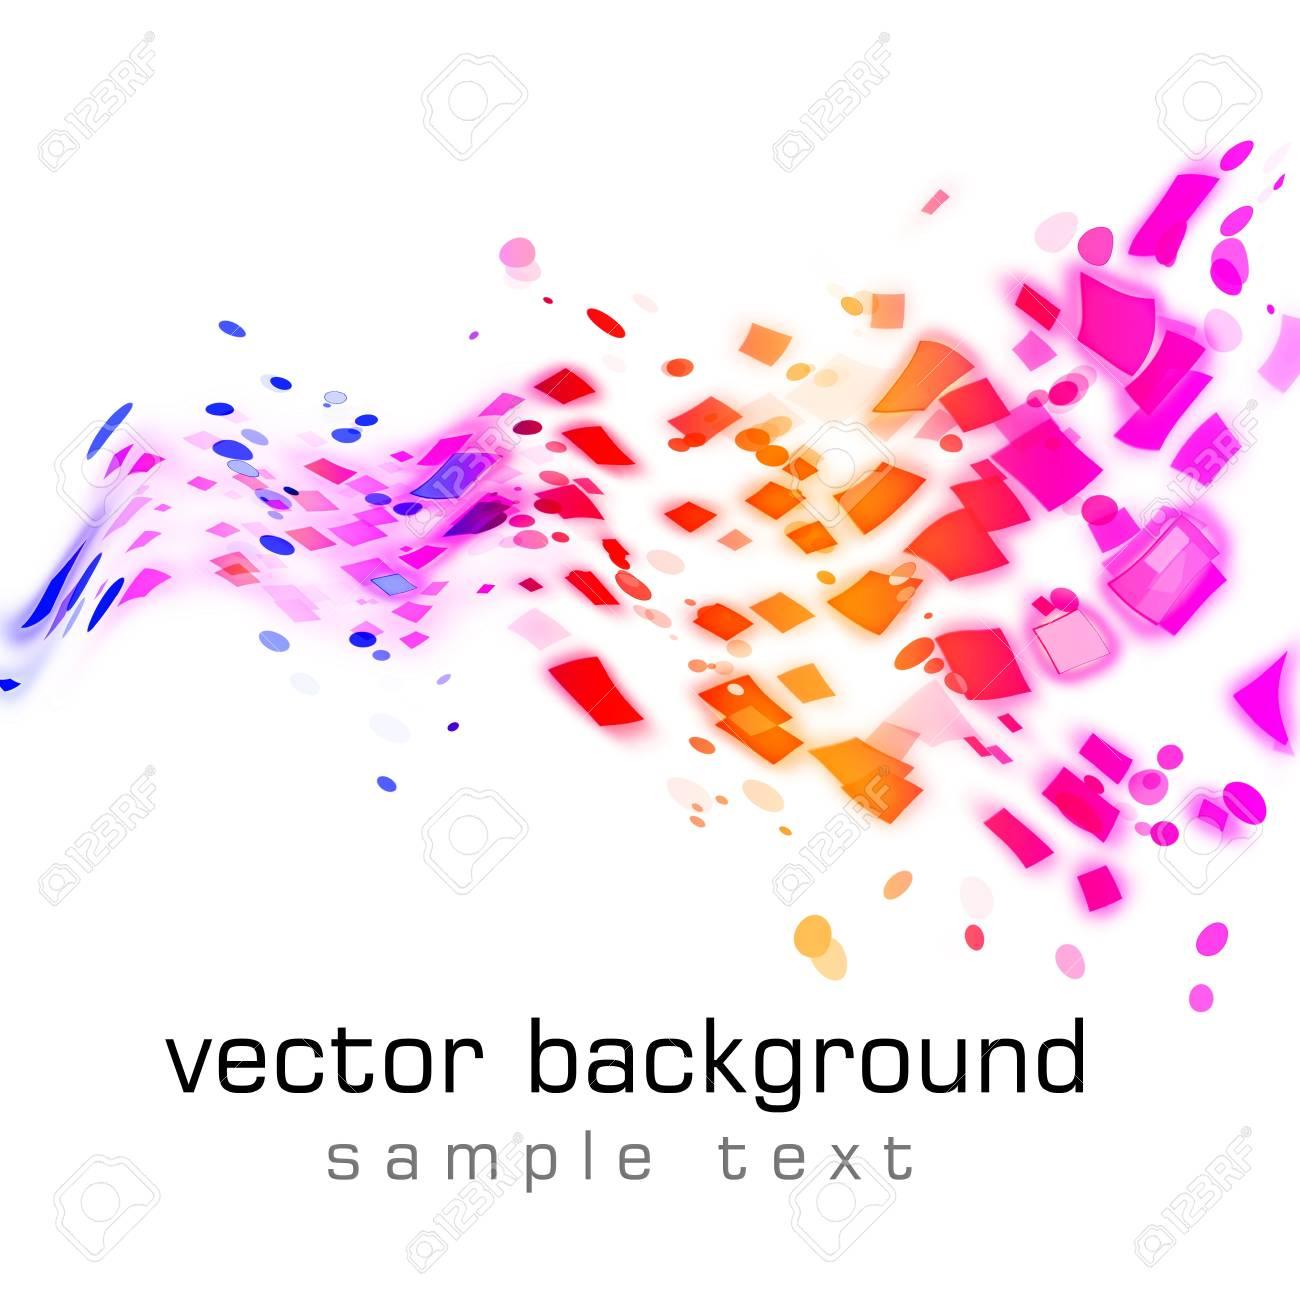 Abstract background bokeh graphic digital illustration Stock Illustration - 11406755